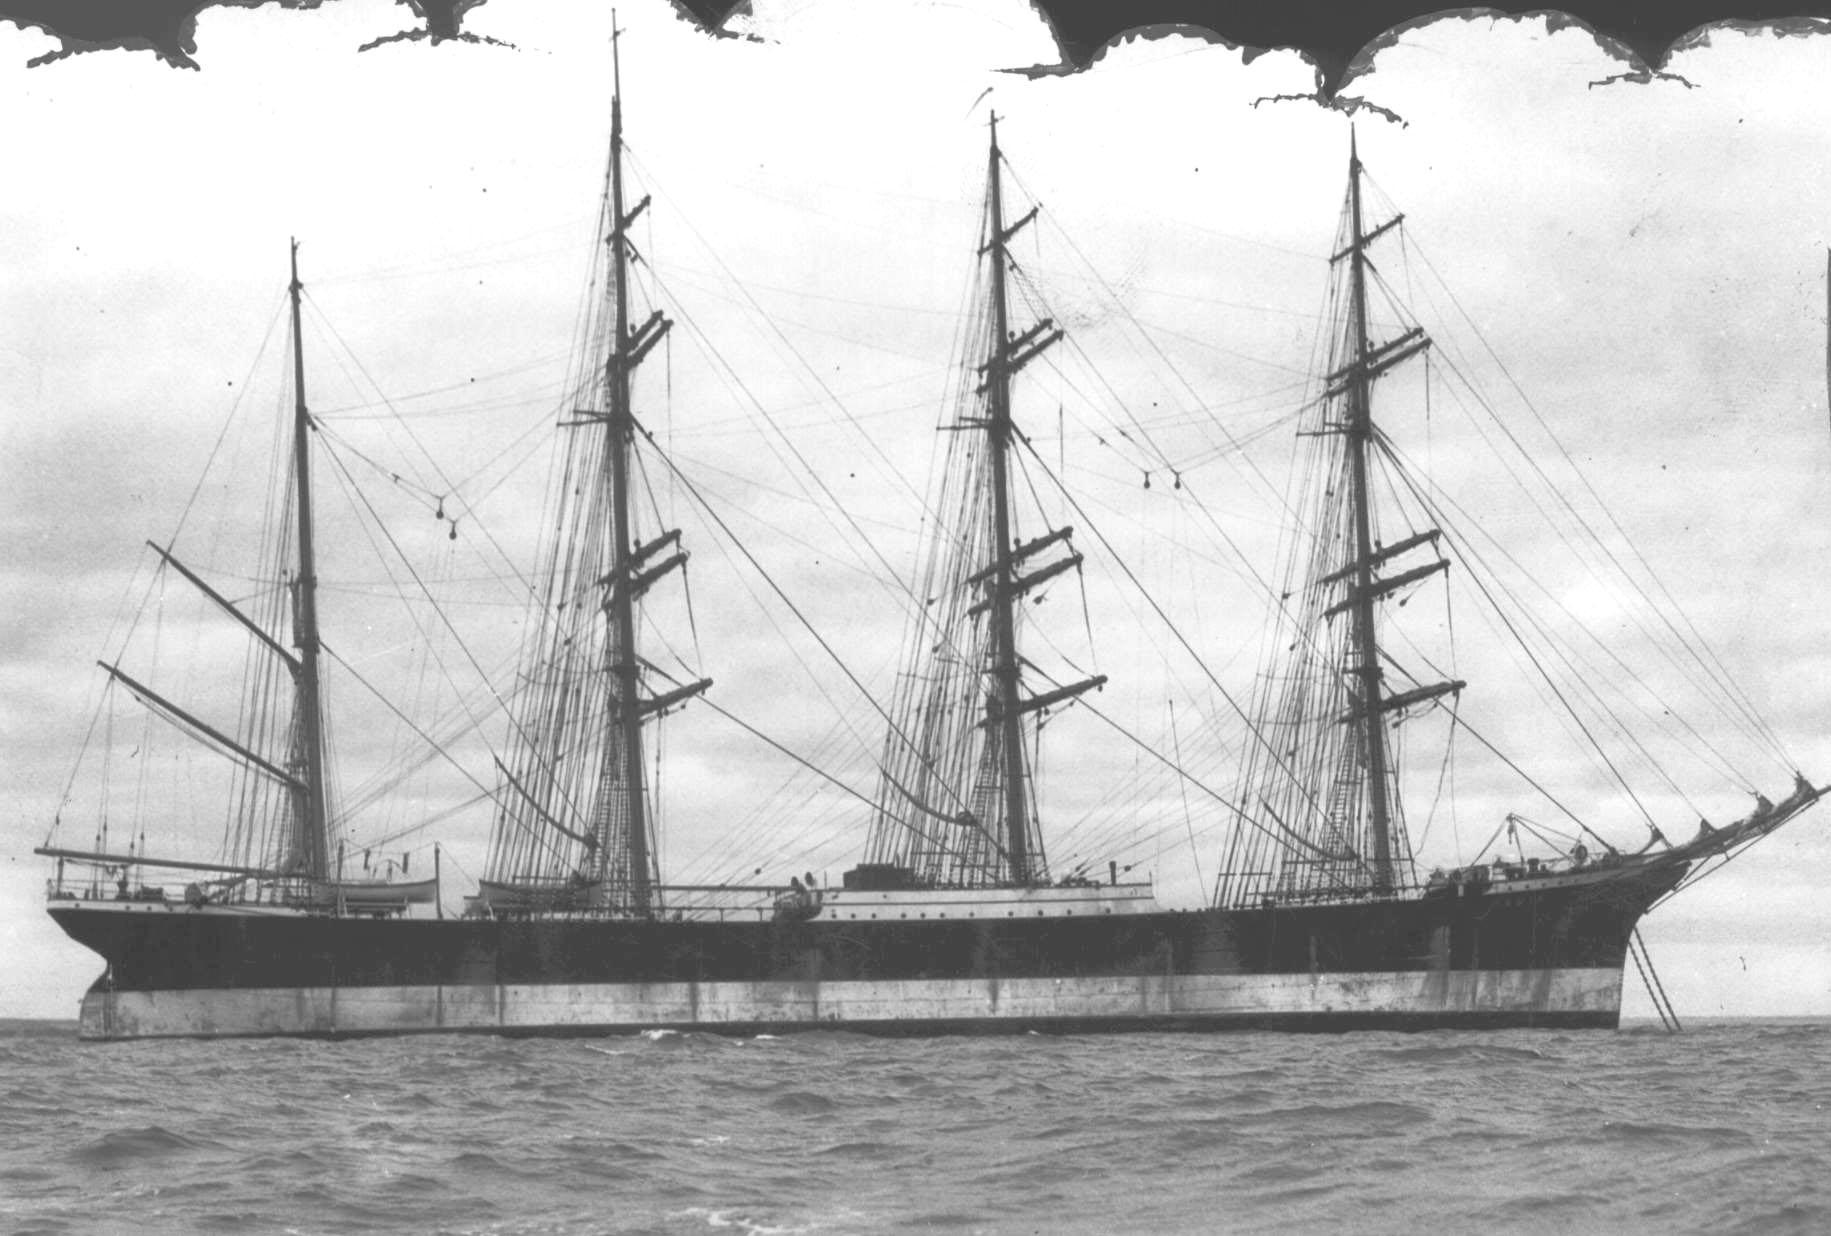 At anchor, Port Victoria, 12/1/1933.